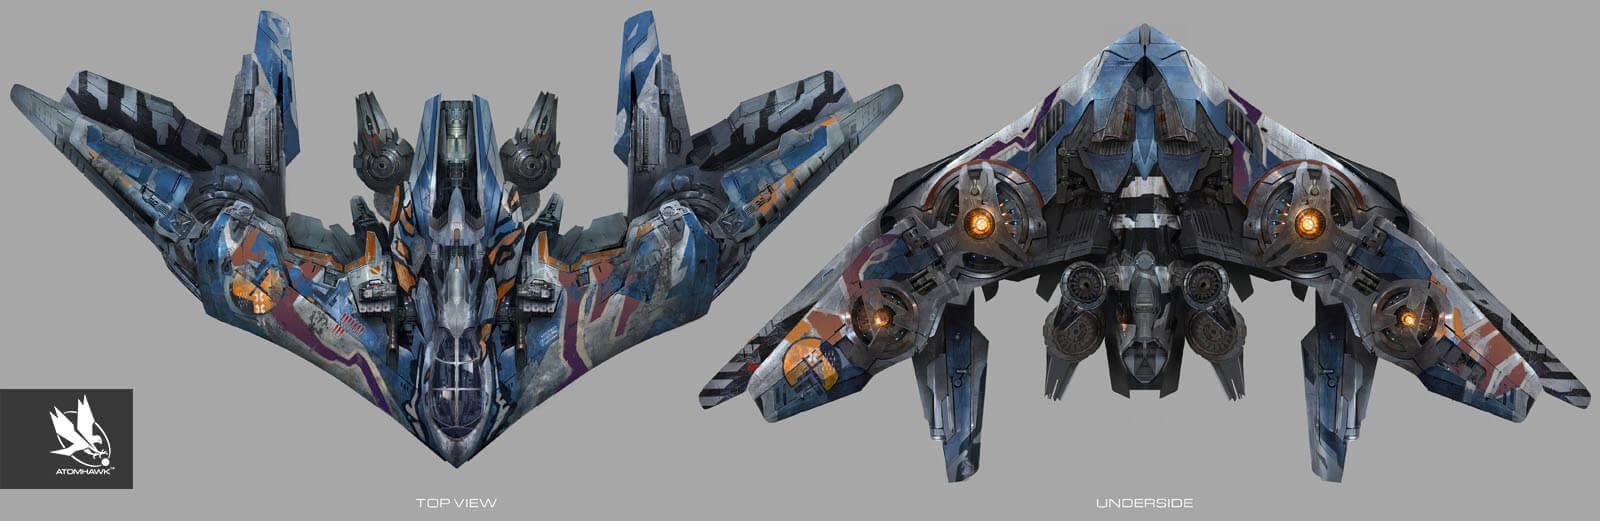 Atomhawk_Marvel_Guardians-of-the-Galaxy_Concept-Art_Spacecraft-Design_Yondu-Fighter.jpg